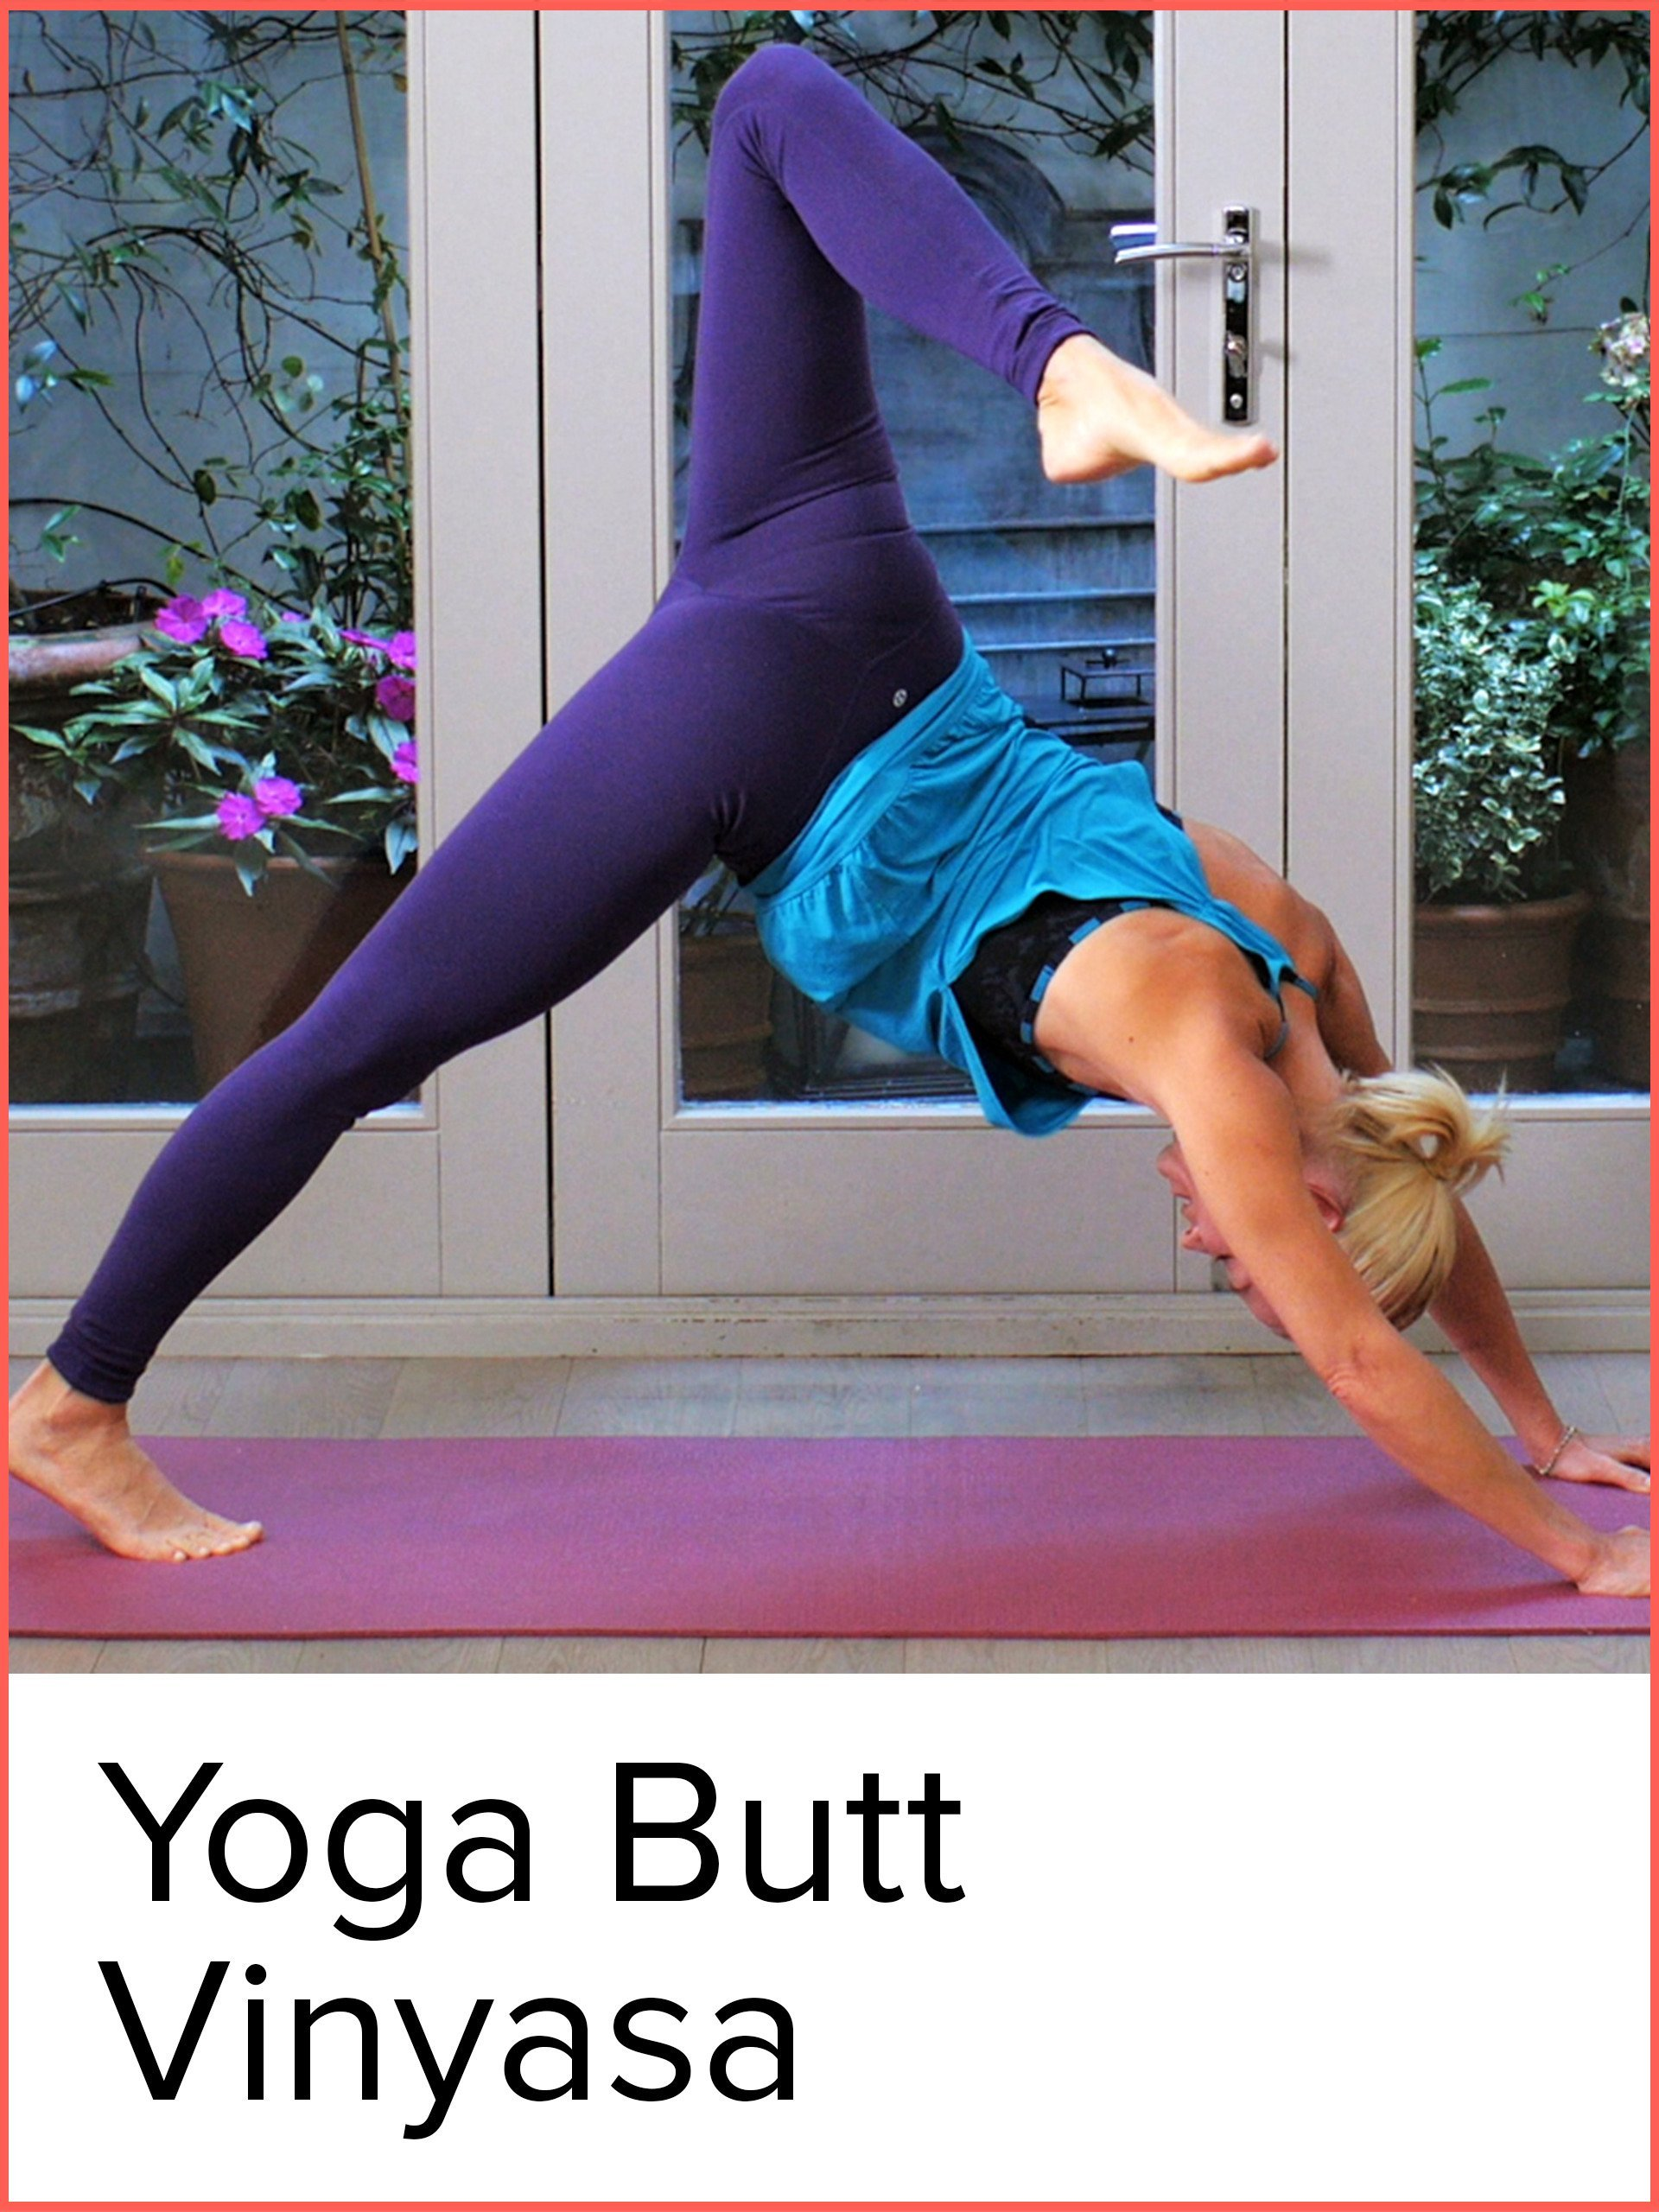 Watch Yoga Butt Vinyasa | Prime Video